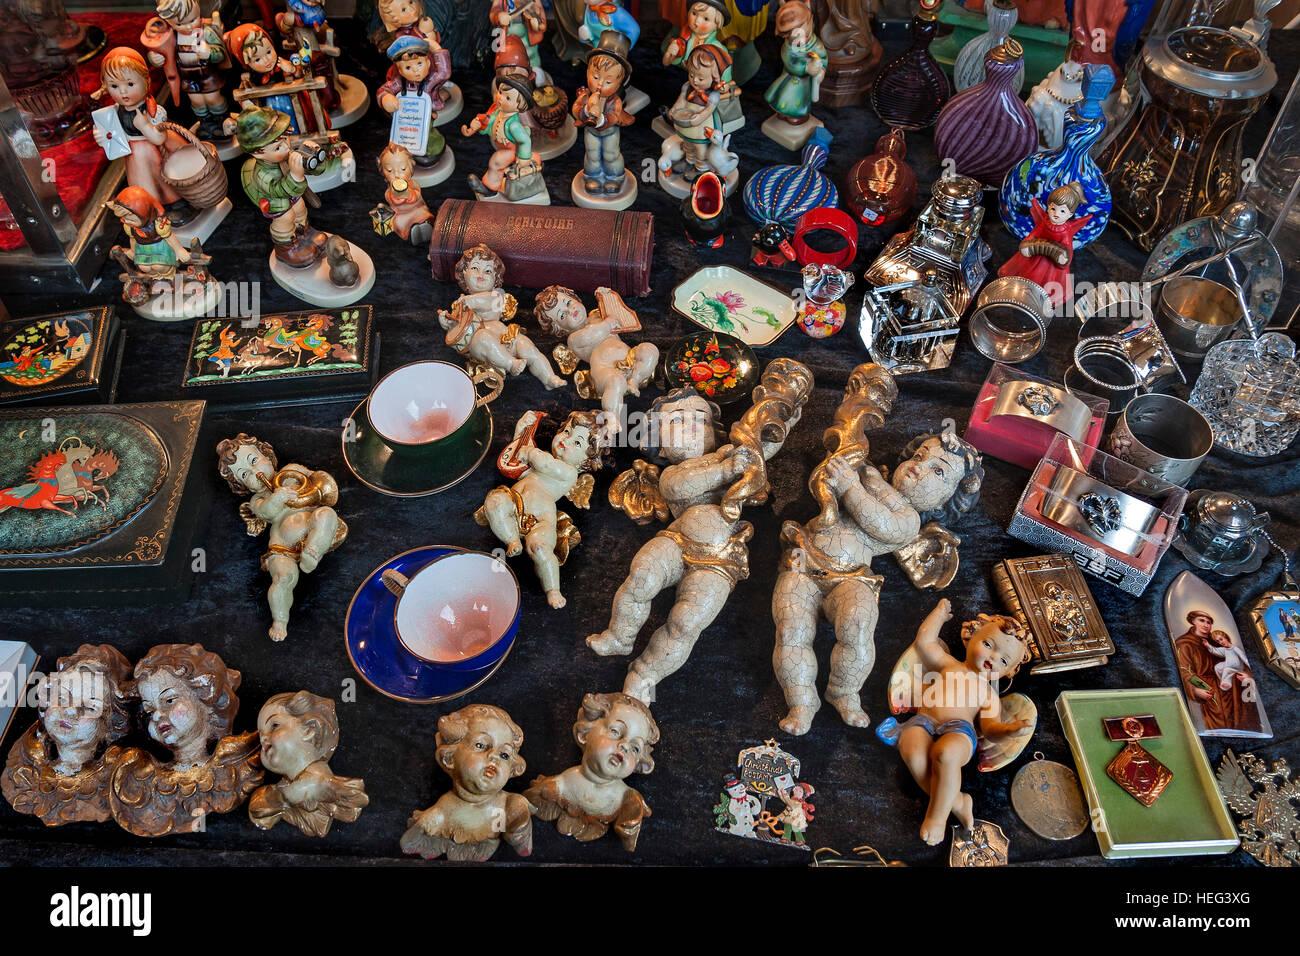 Hummel figurines, Auer Dult, Munich, Bavaria, Germany - Stock Image